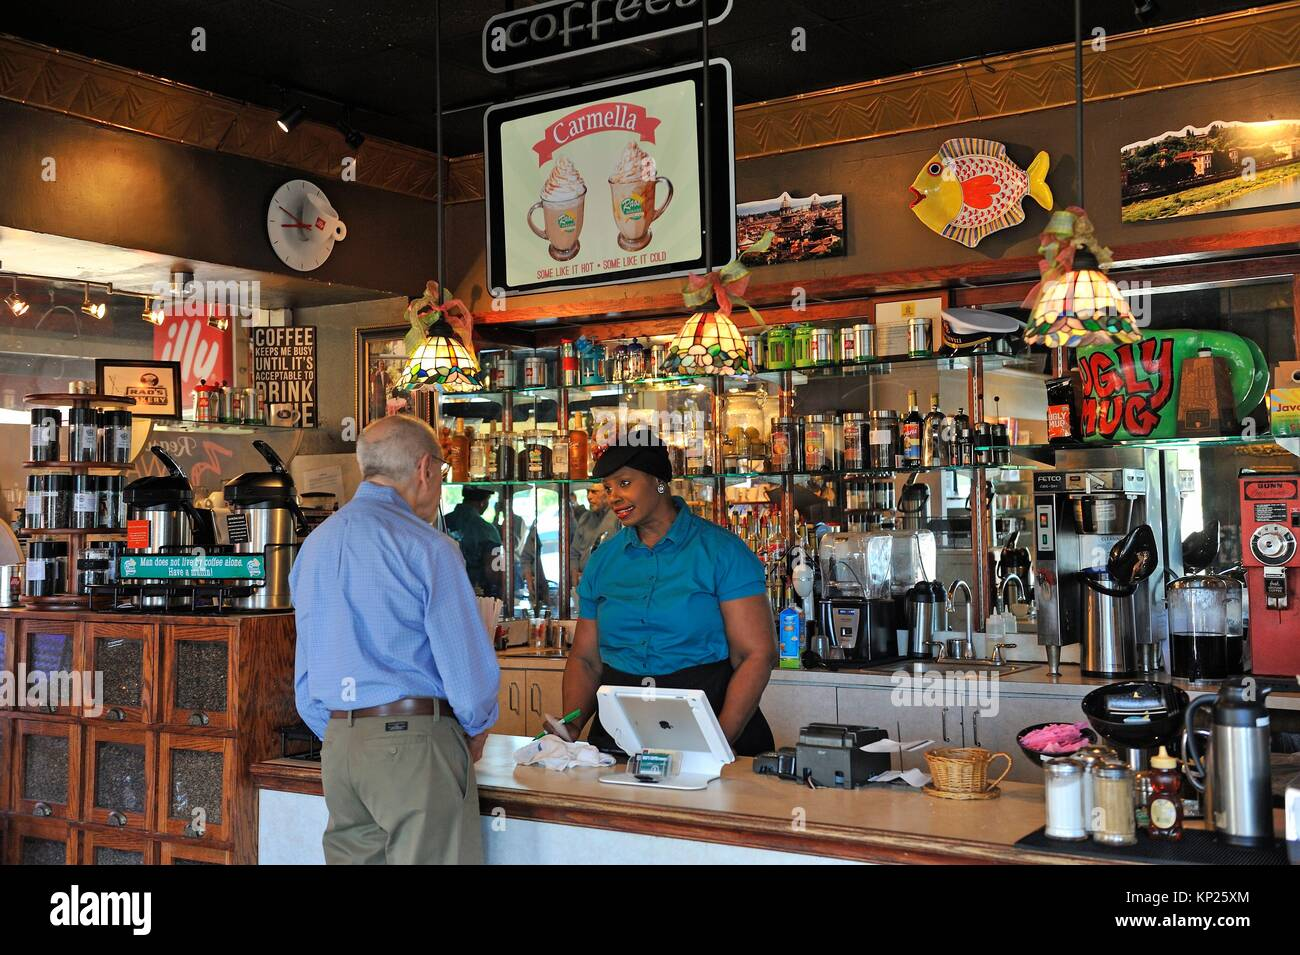 Main Street Cafe Murfreesboro Tn